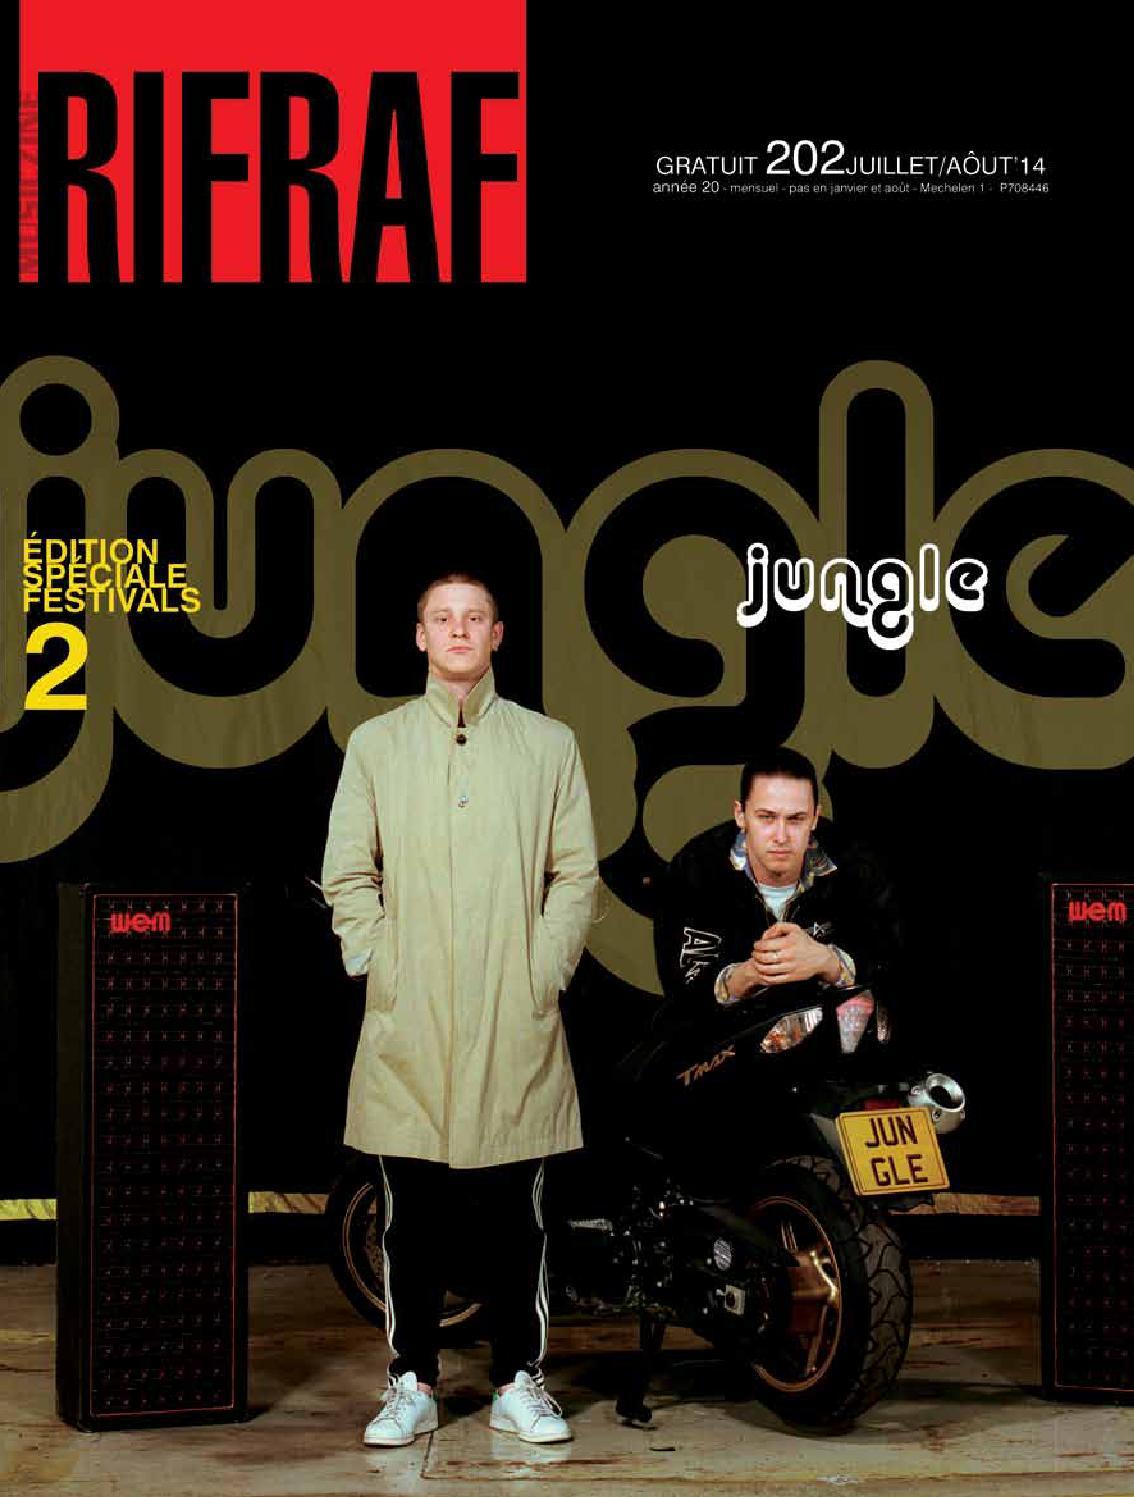 RifRaf juillet 2014 FR by RifRaf musiczine issuu